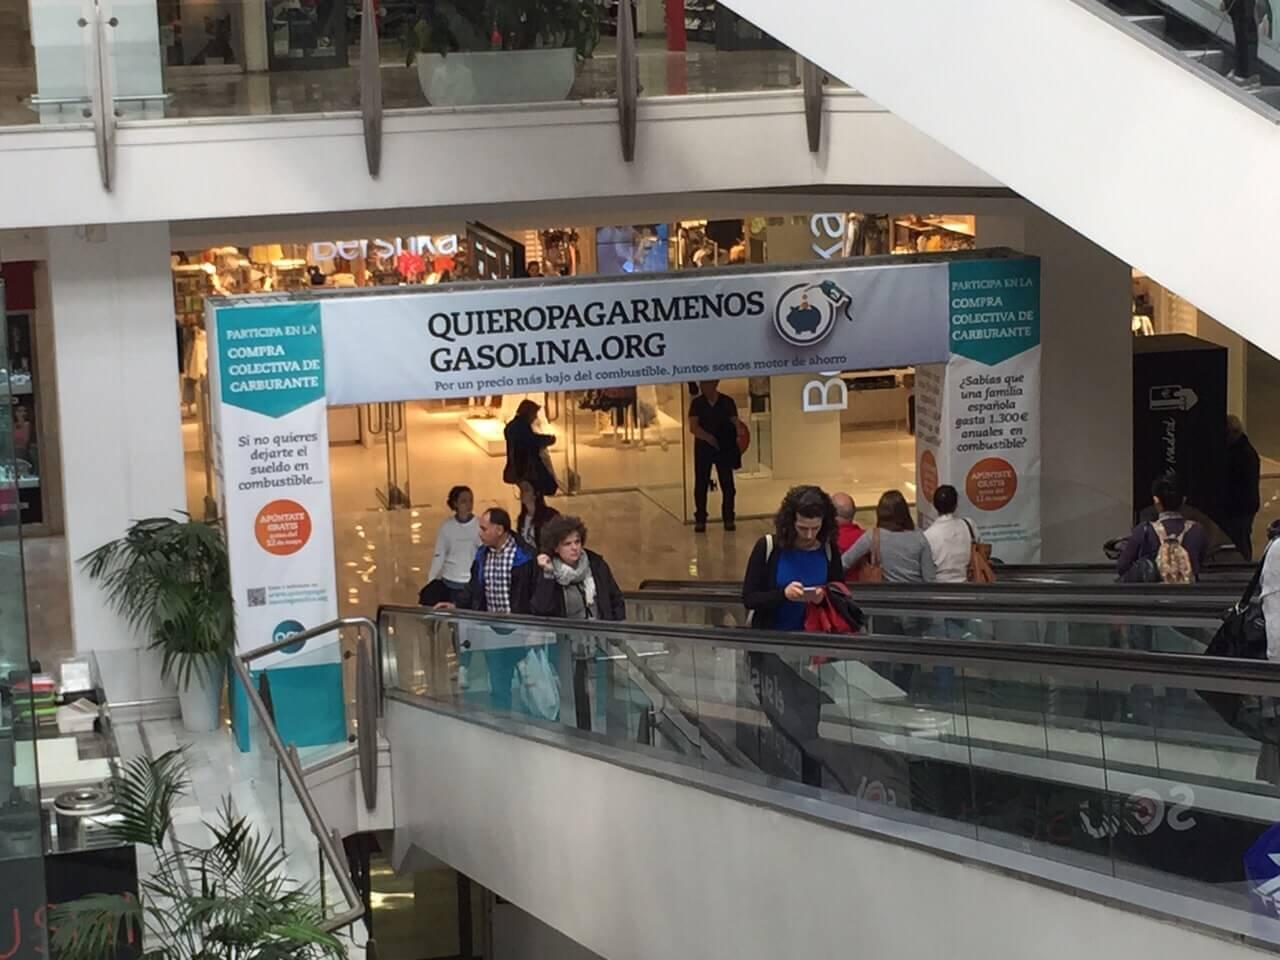 empresa decoracion carteles publicitarios en centros comerciales